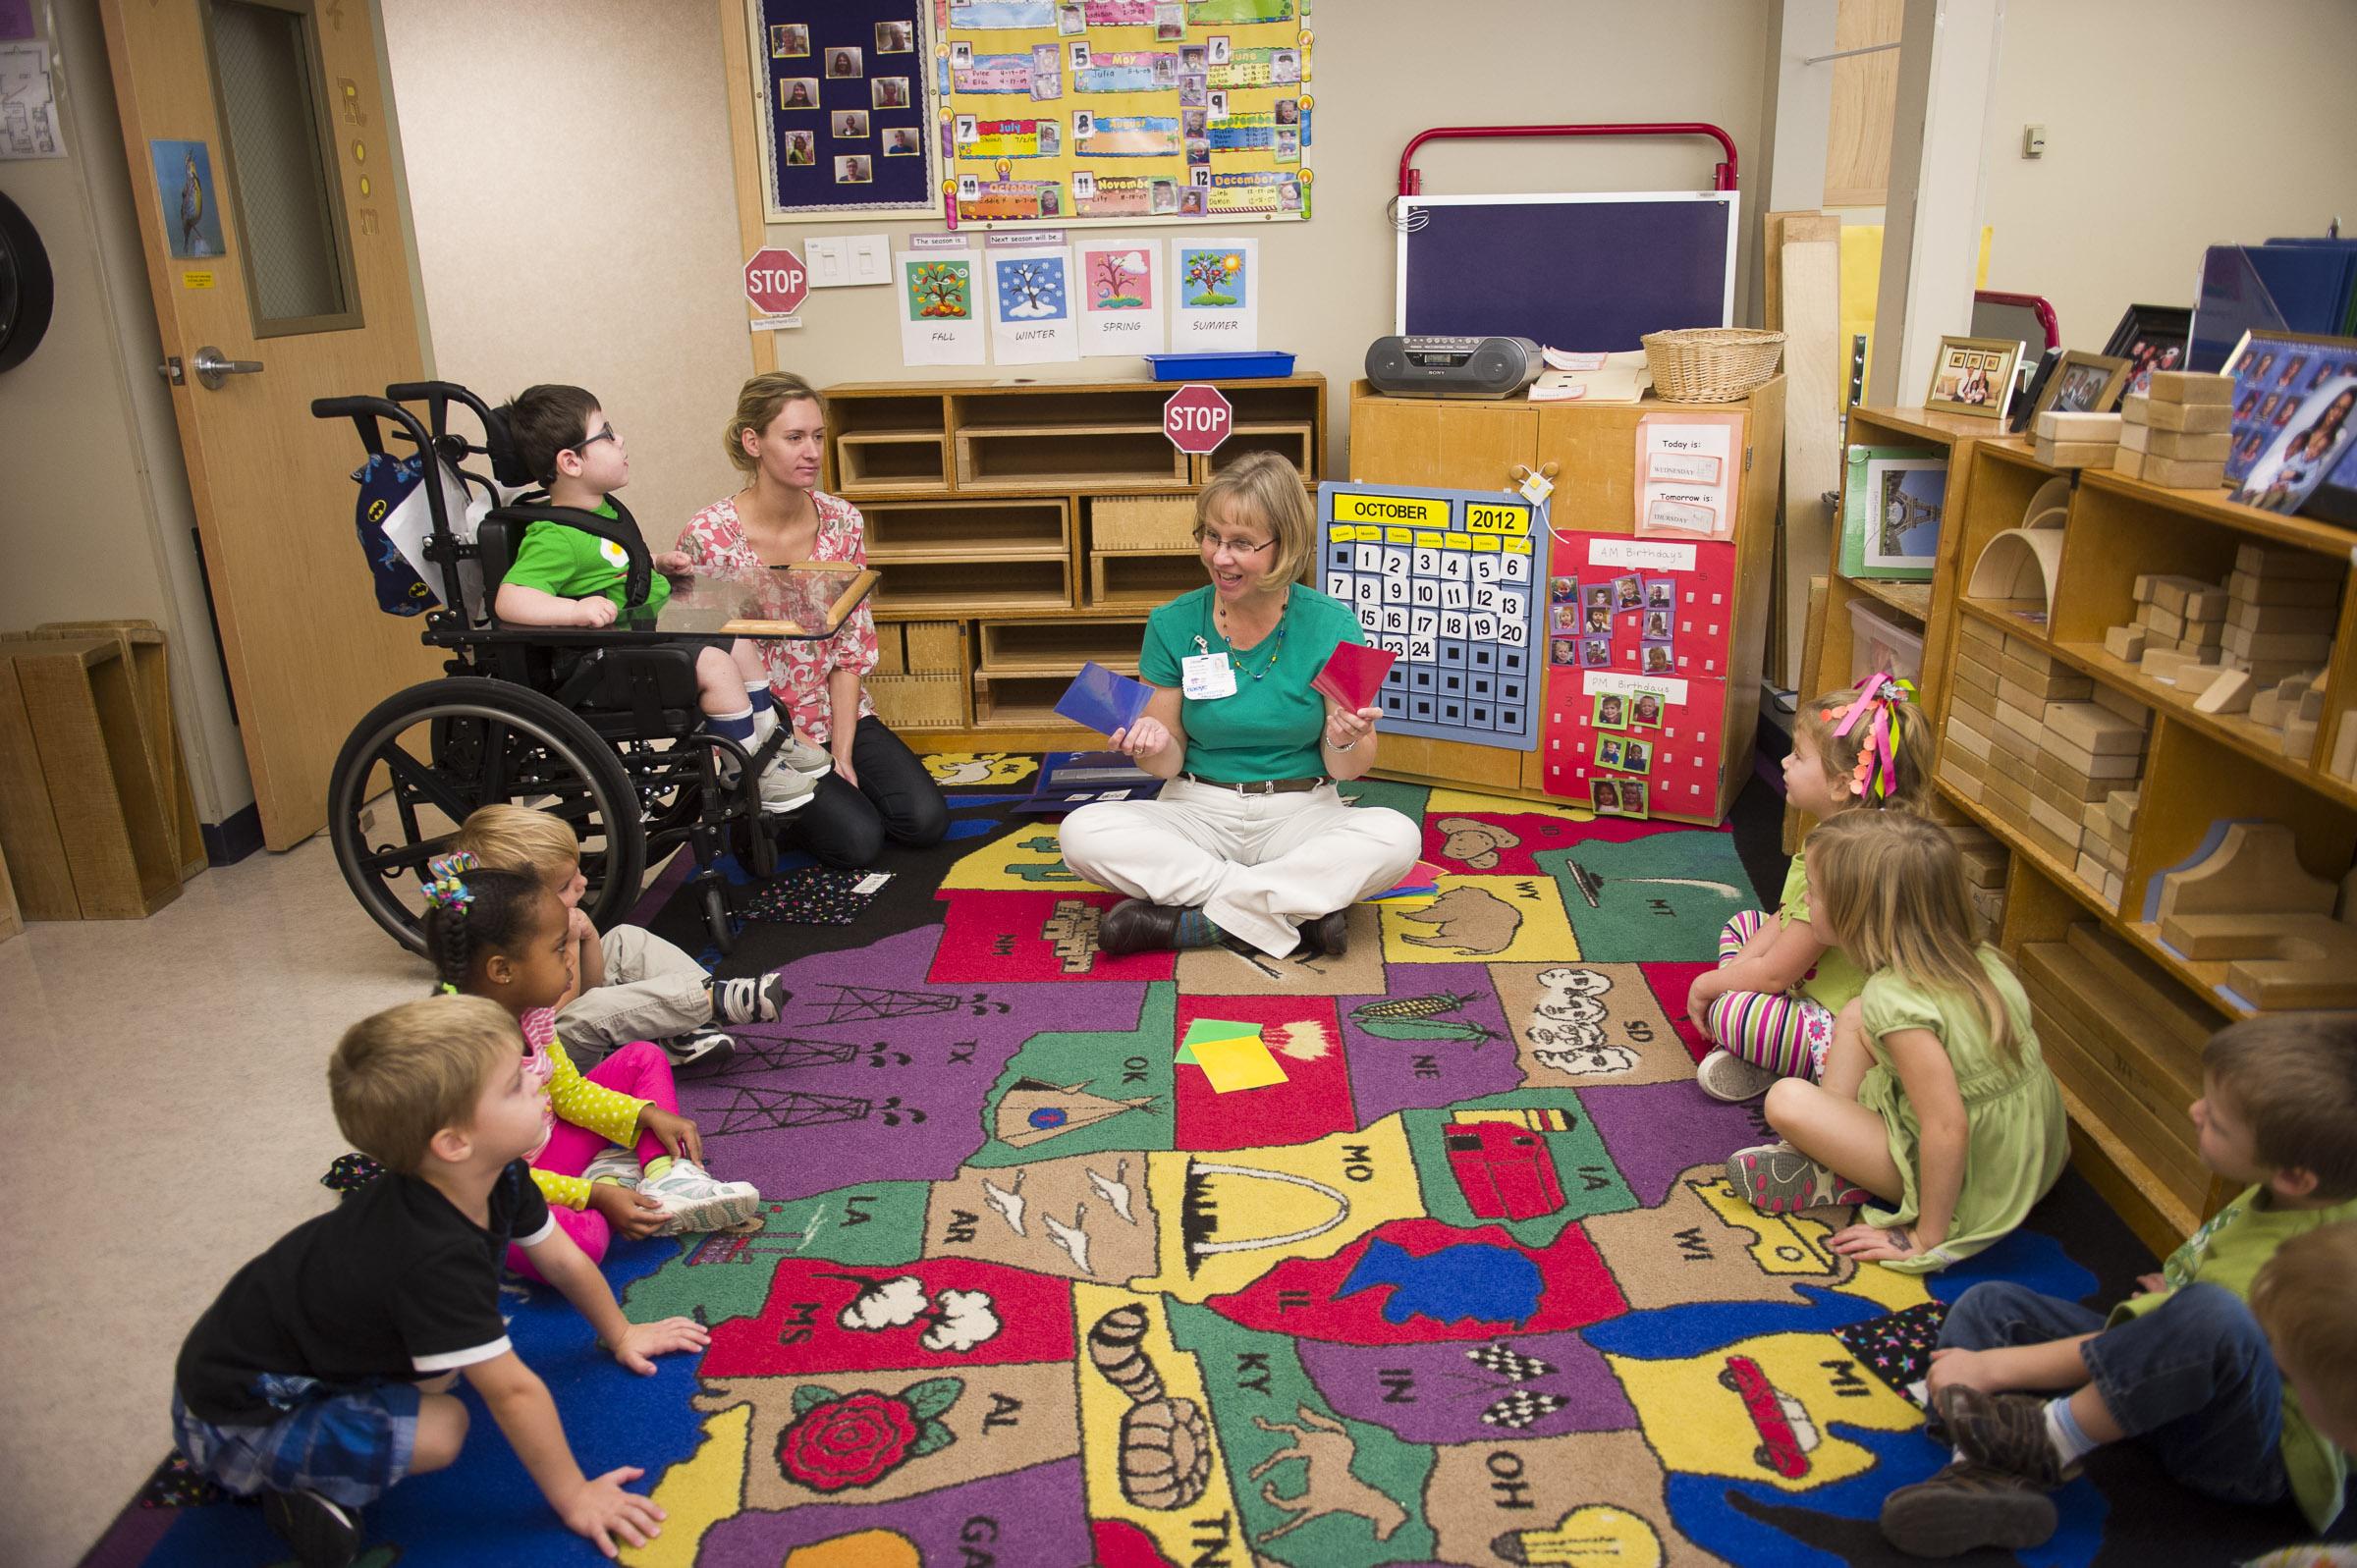 Child Development Scholar Suggests Strategies To Build